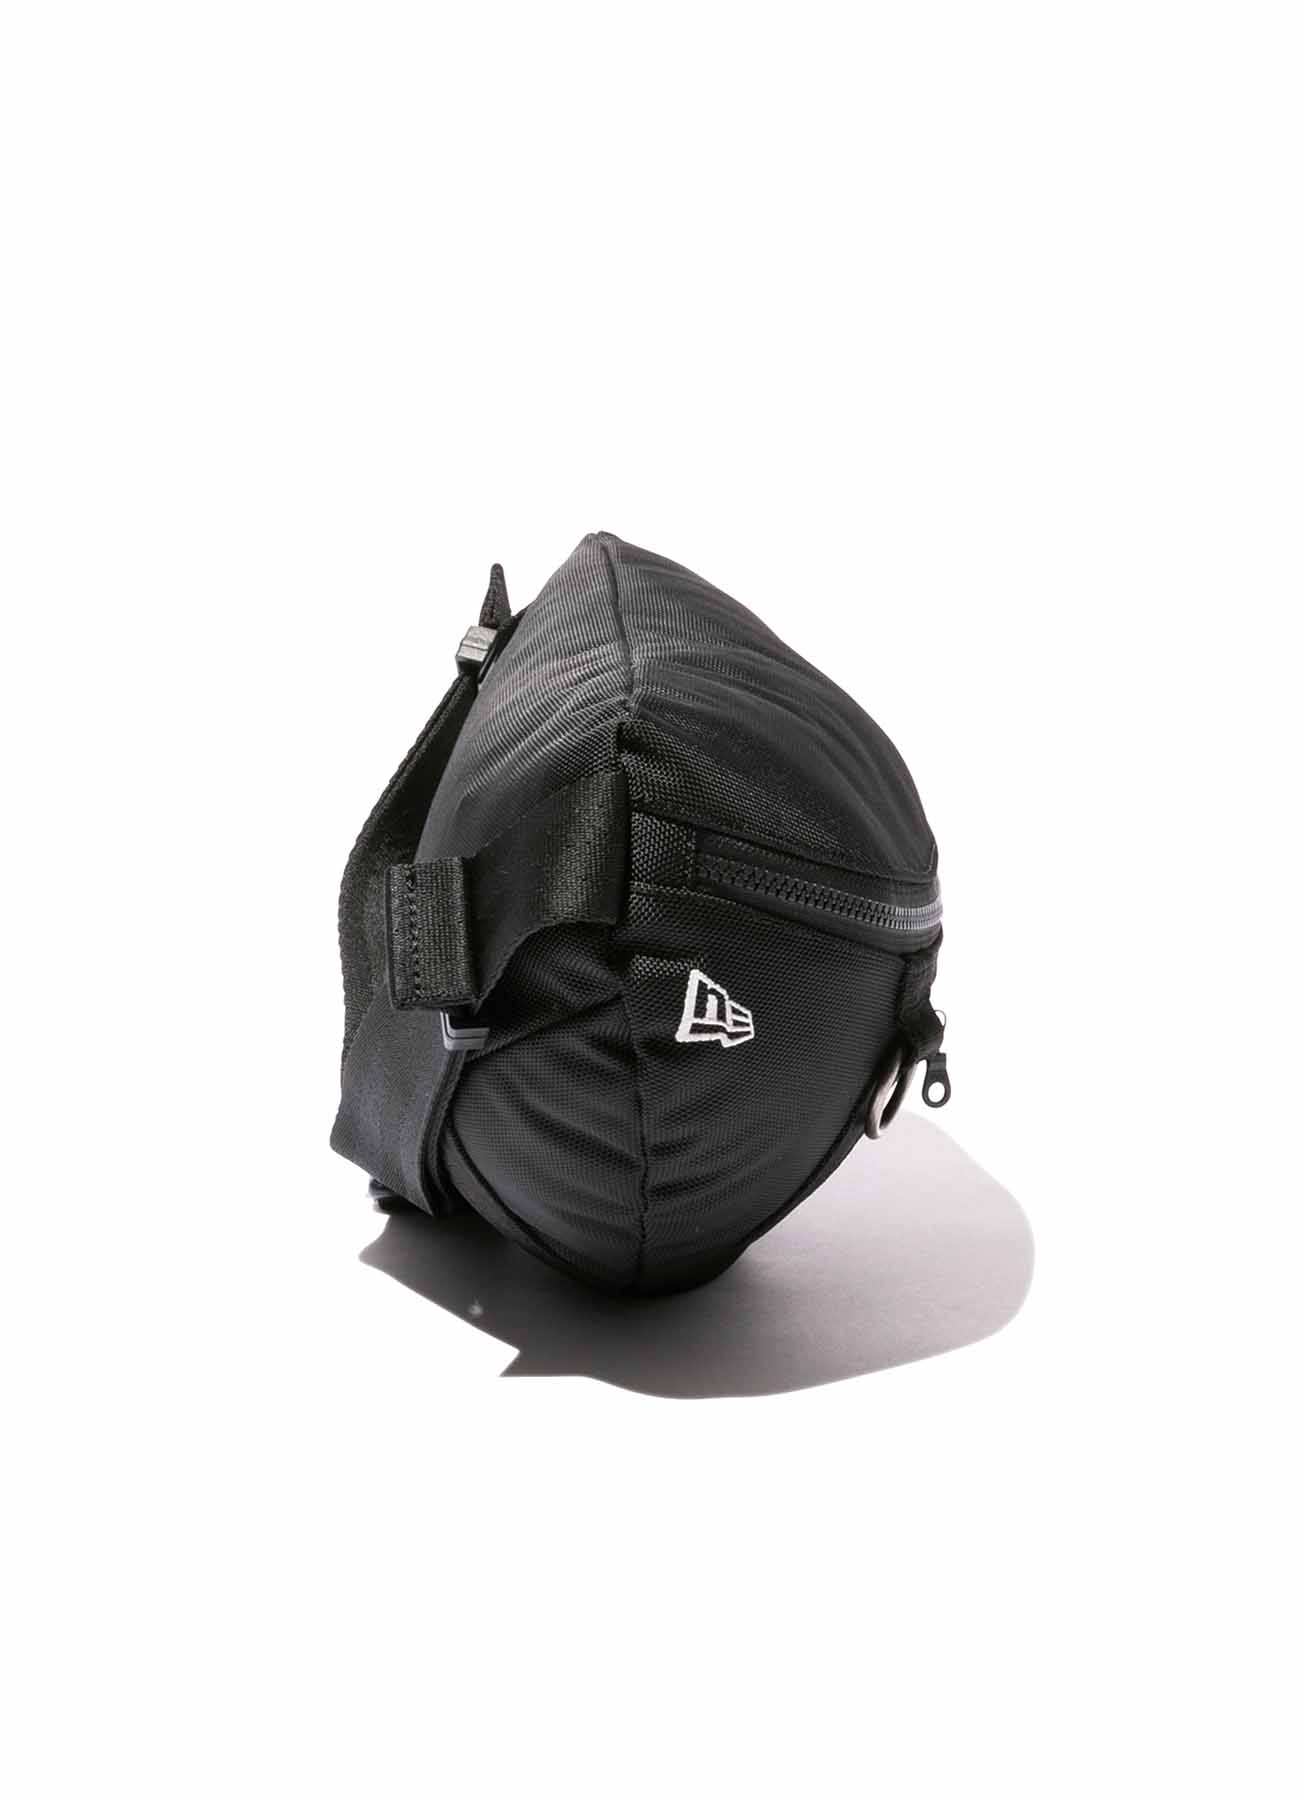 Yohji Yamamoto × New Era 1680D/BLACK POLYESTER WAIST BAG